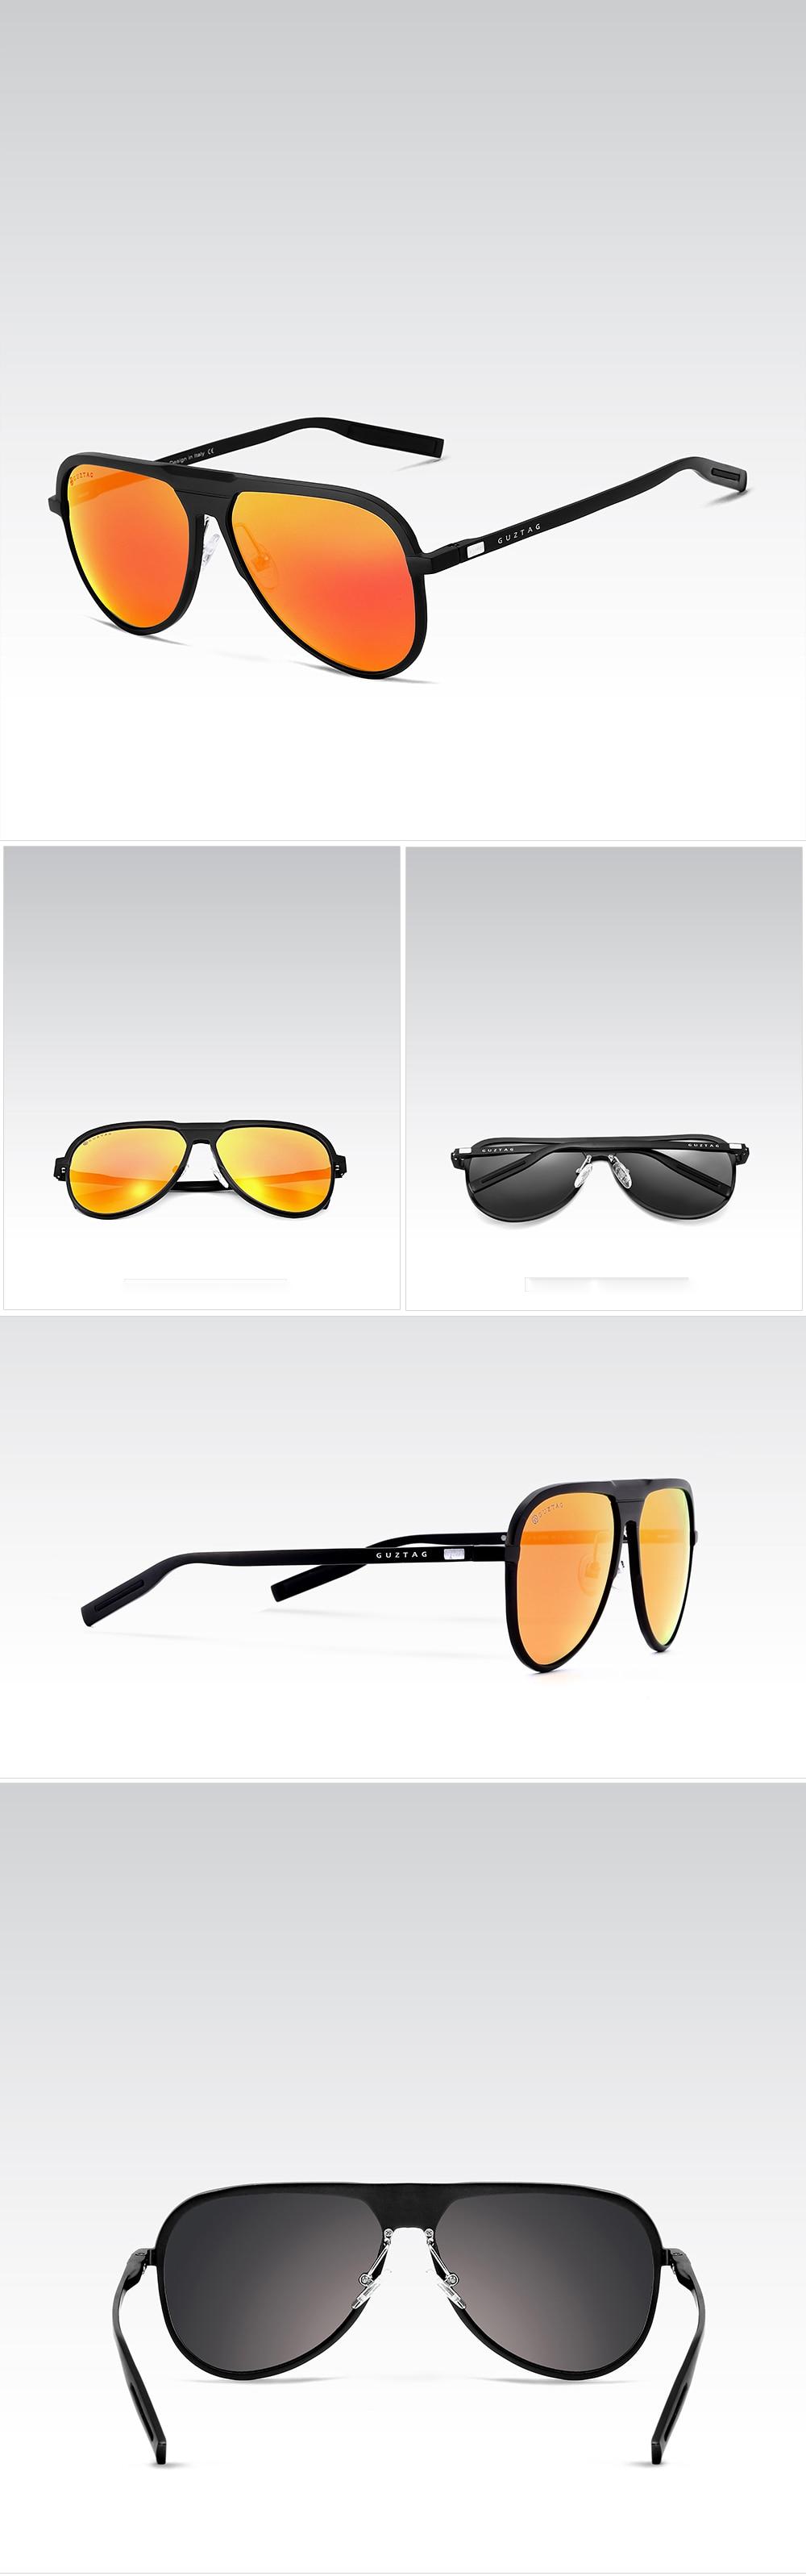 fd8c232d5d GUZTAG Unisex Classic Brand Men Aluminum Sunglasses HD Polarized ...